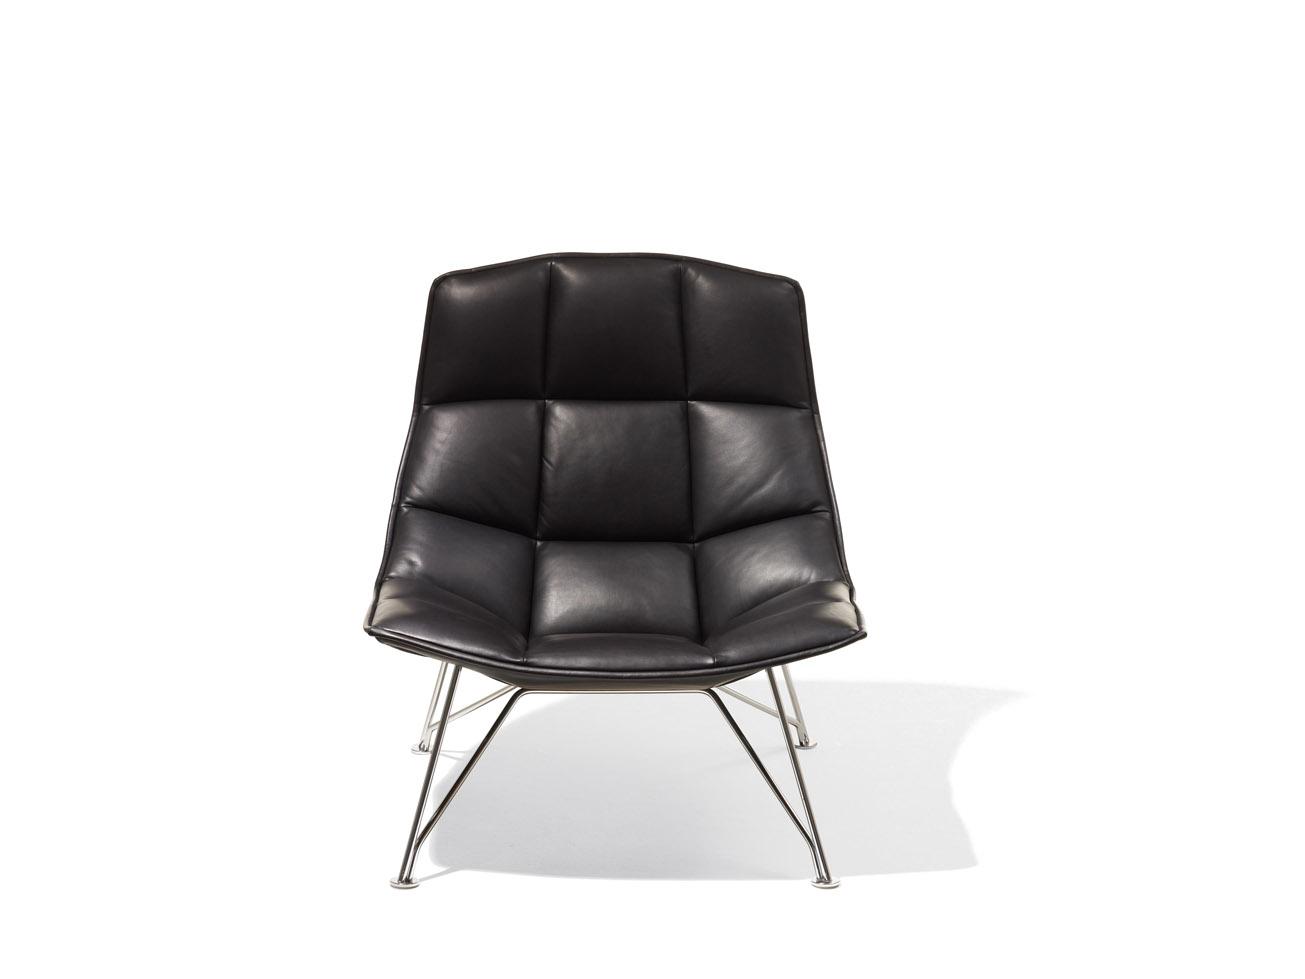 jehs laub lounge chair custom outdoor cushions covers 43laub knoll